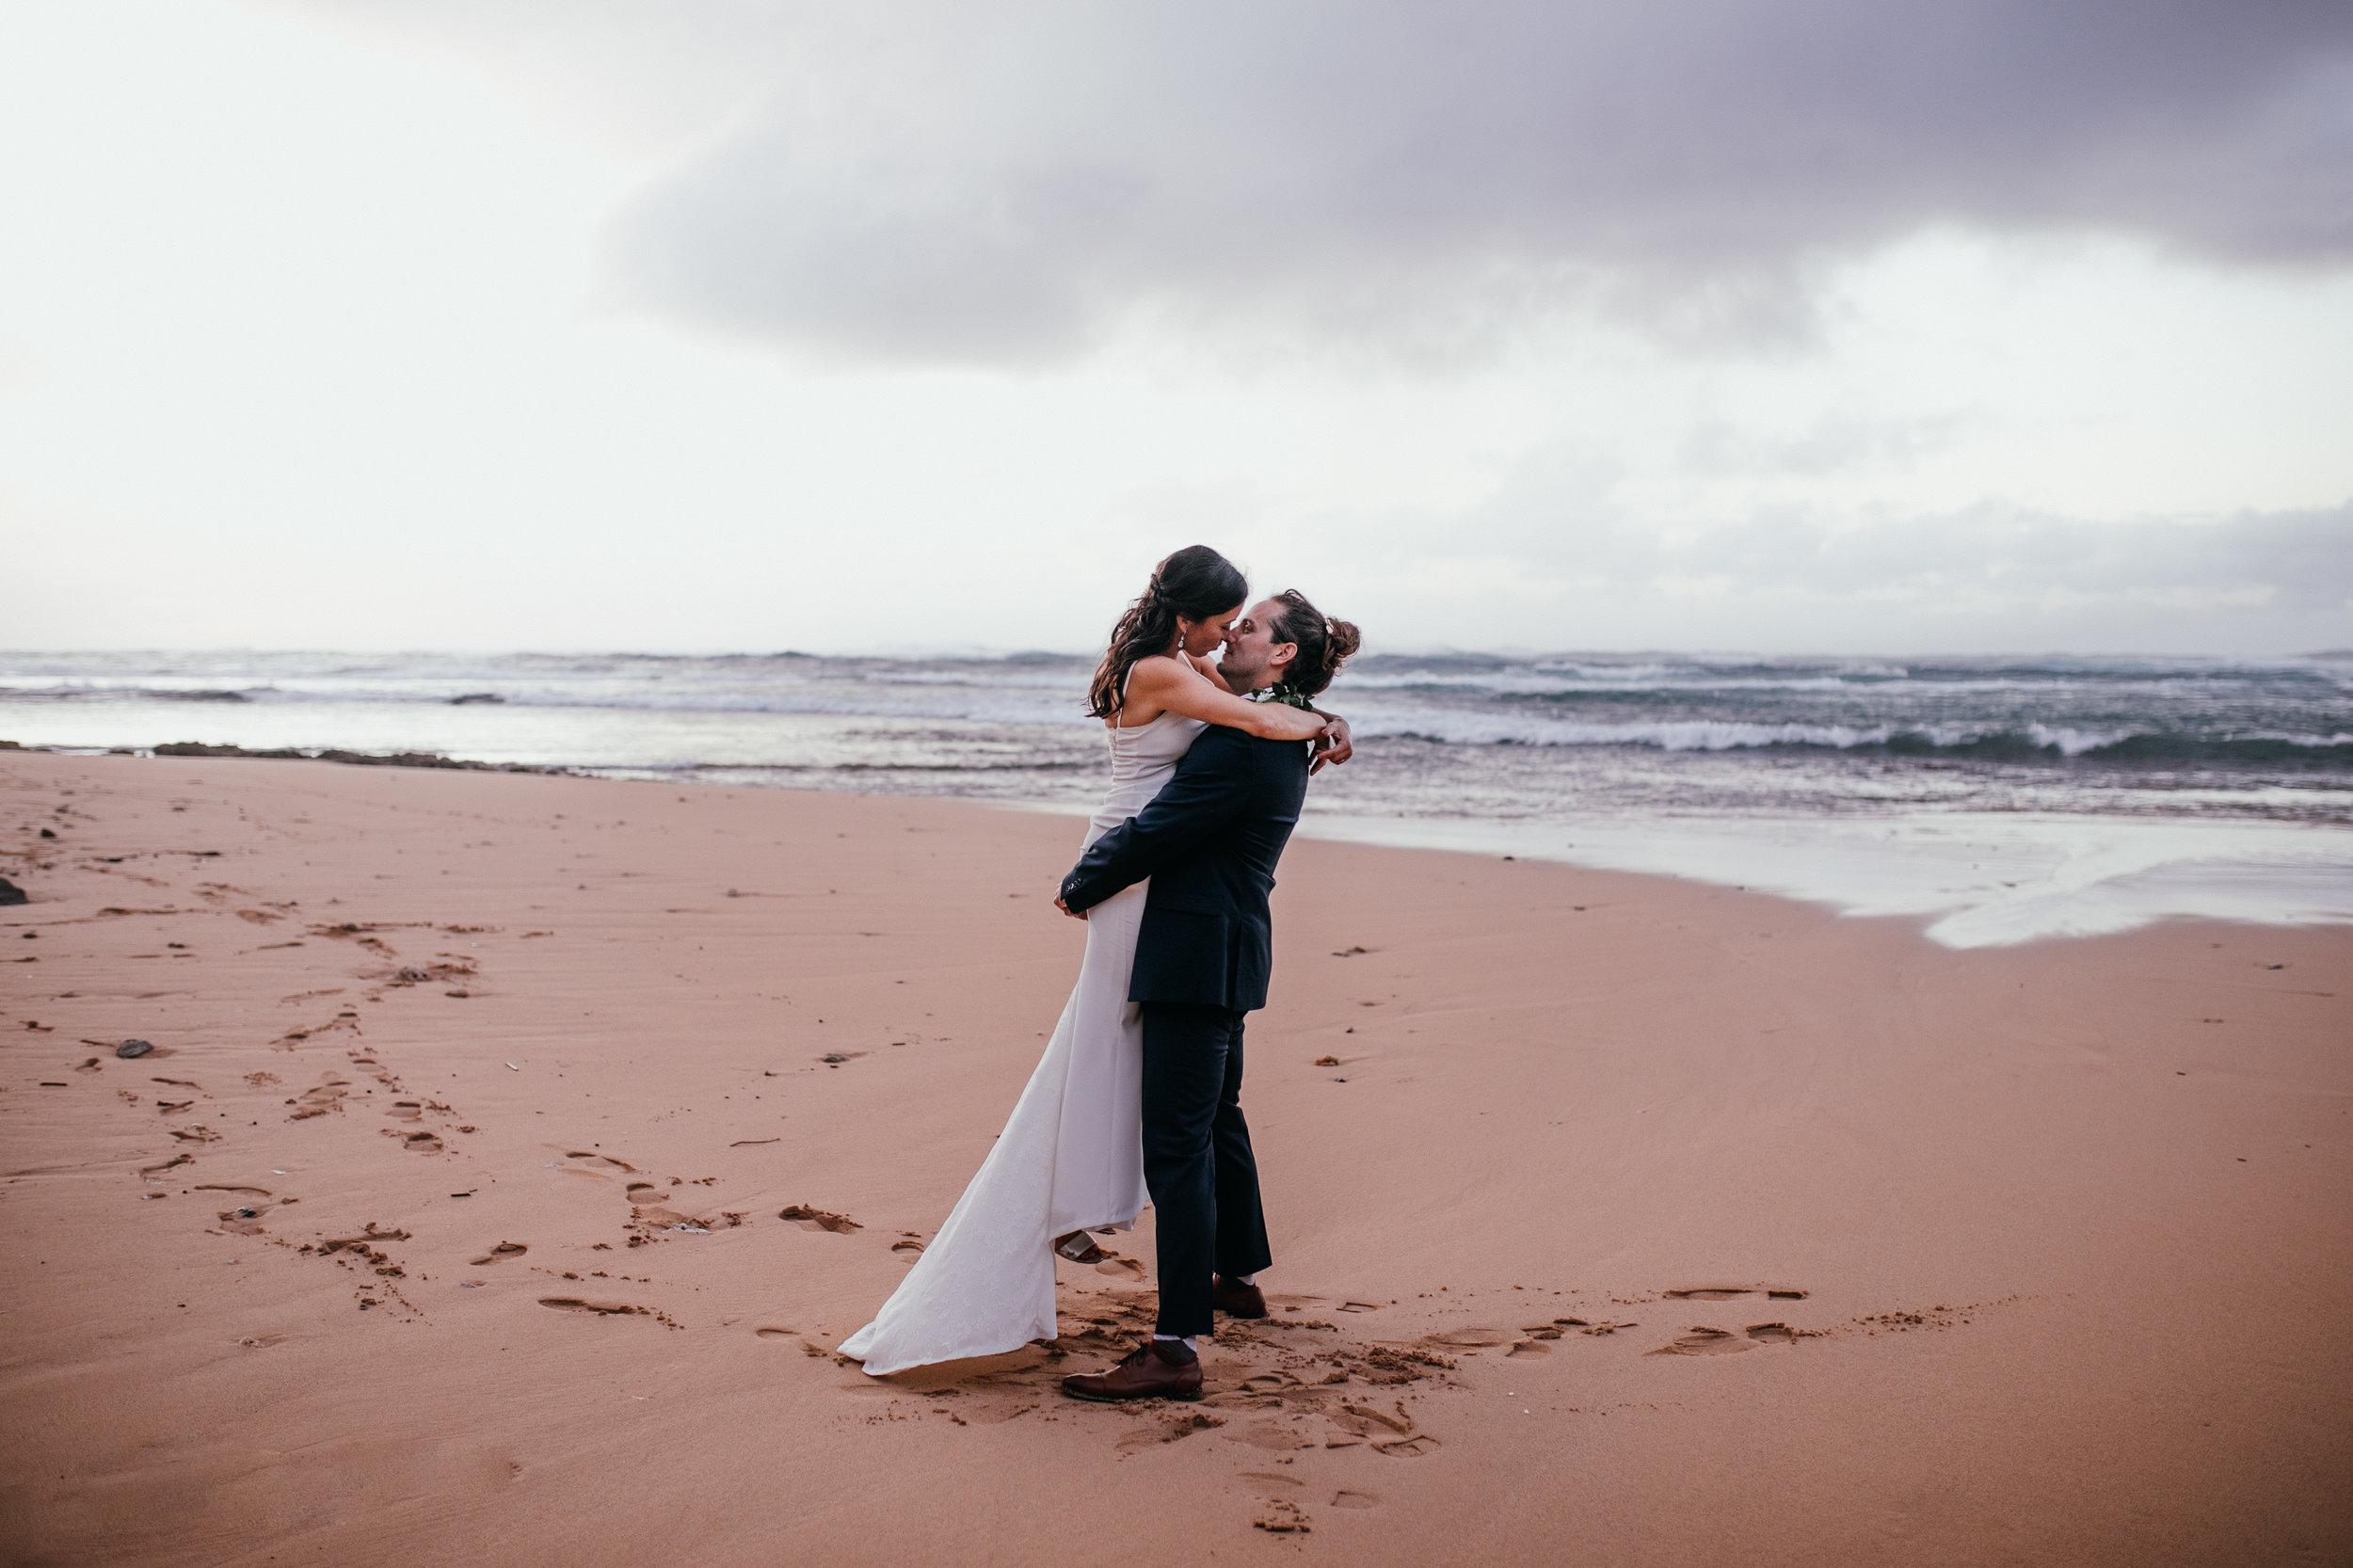 Oahu Hawaii wedding adventure elopement Emily Choy Photographer